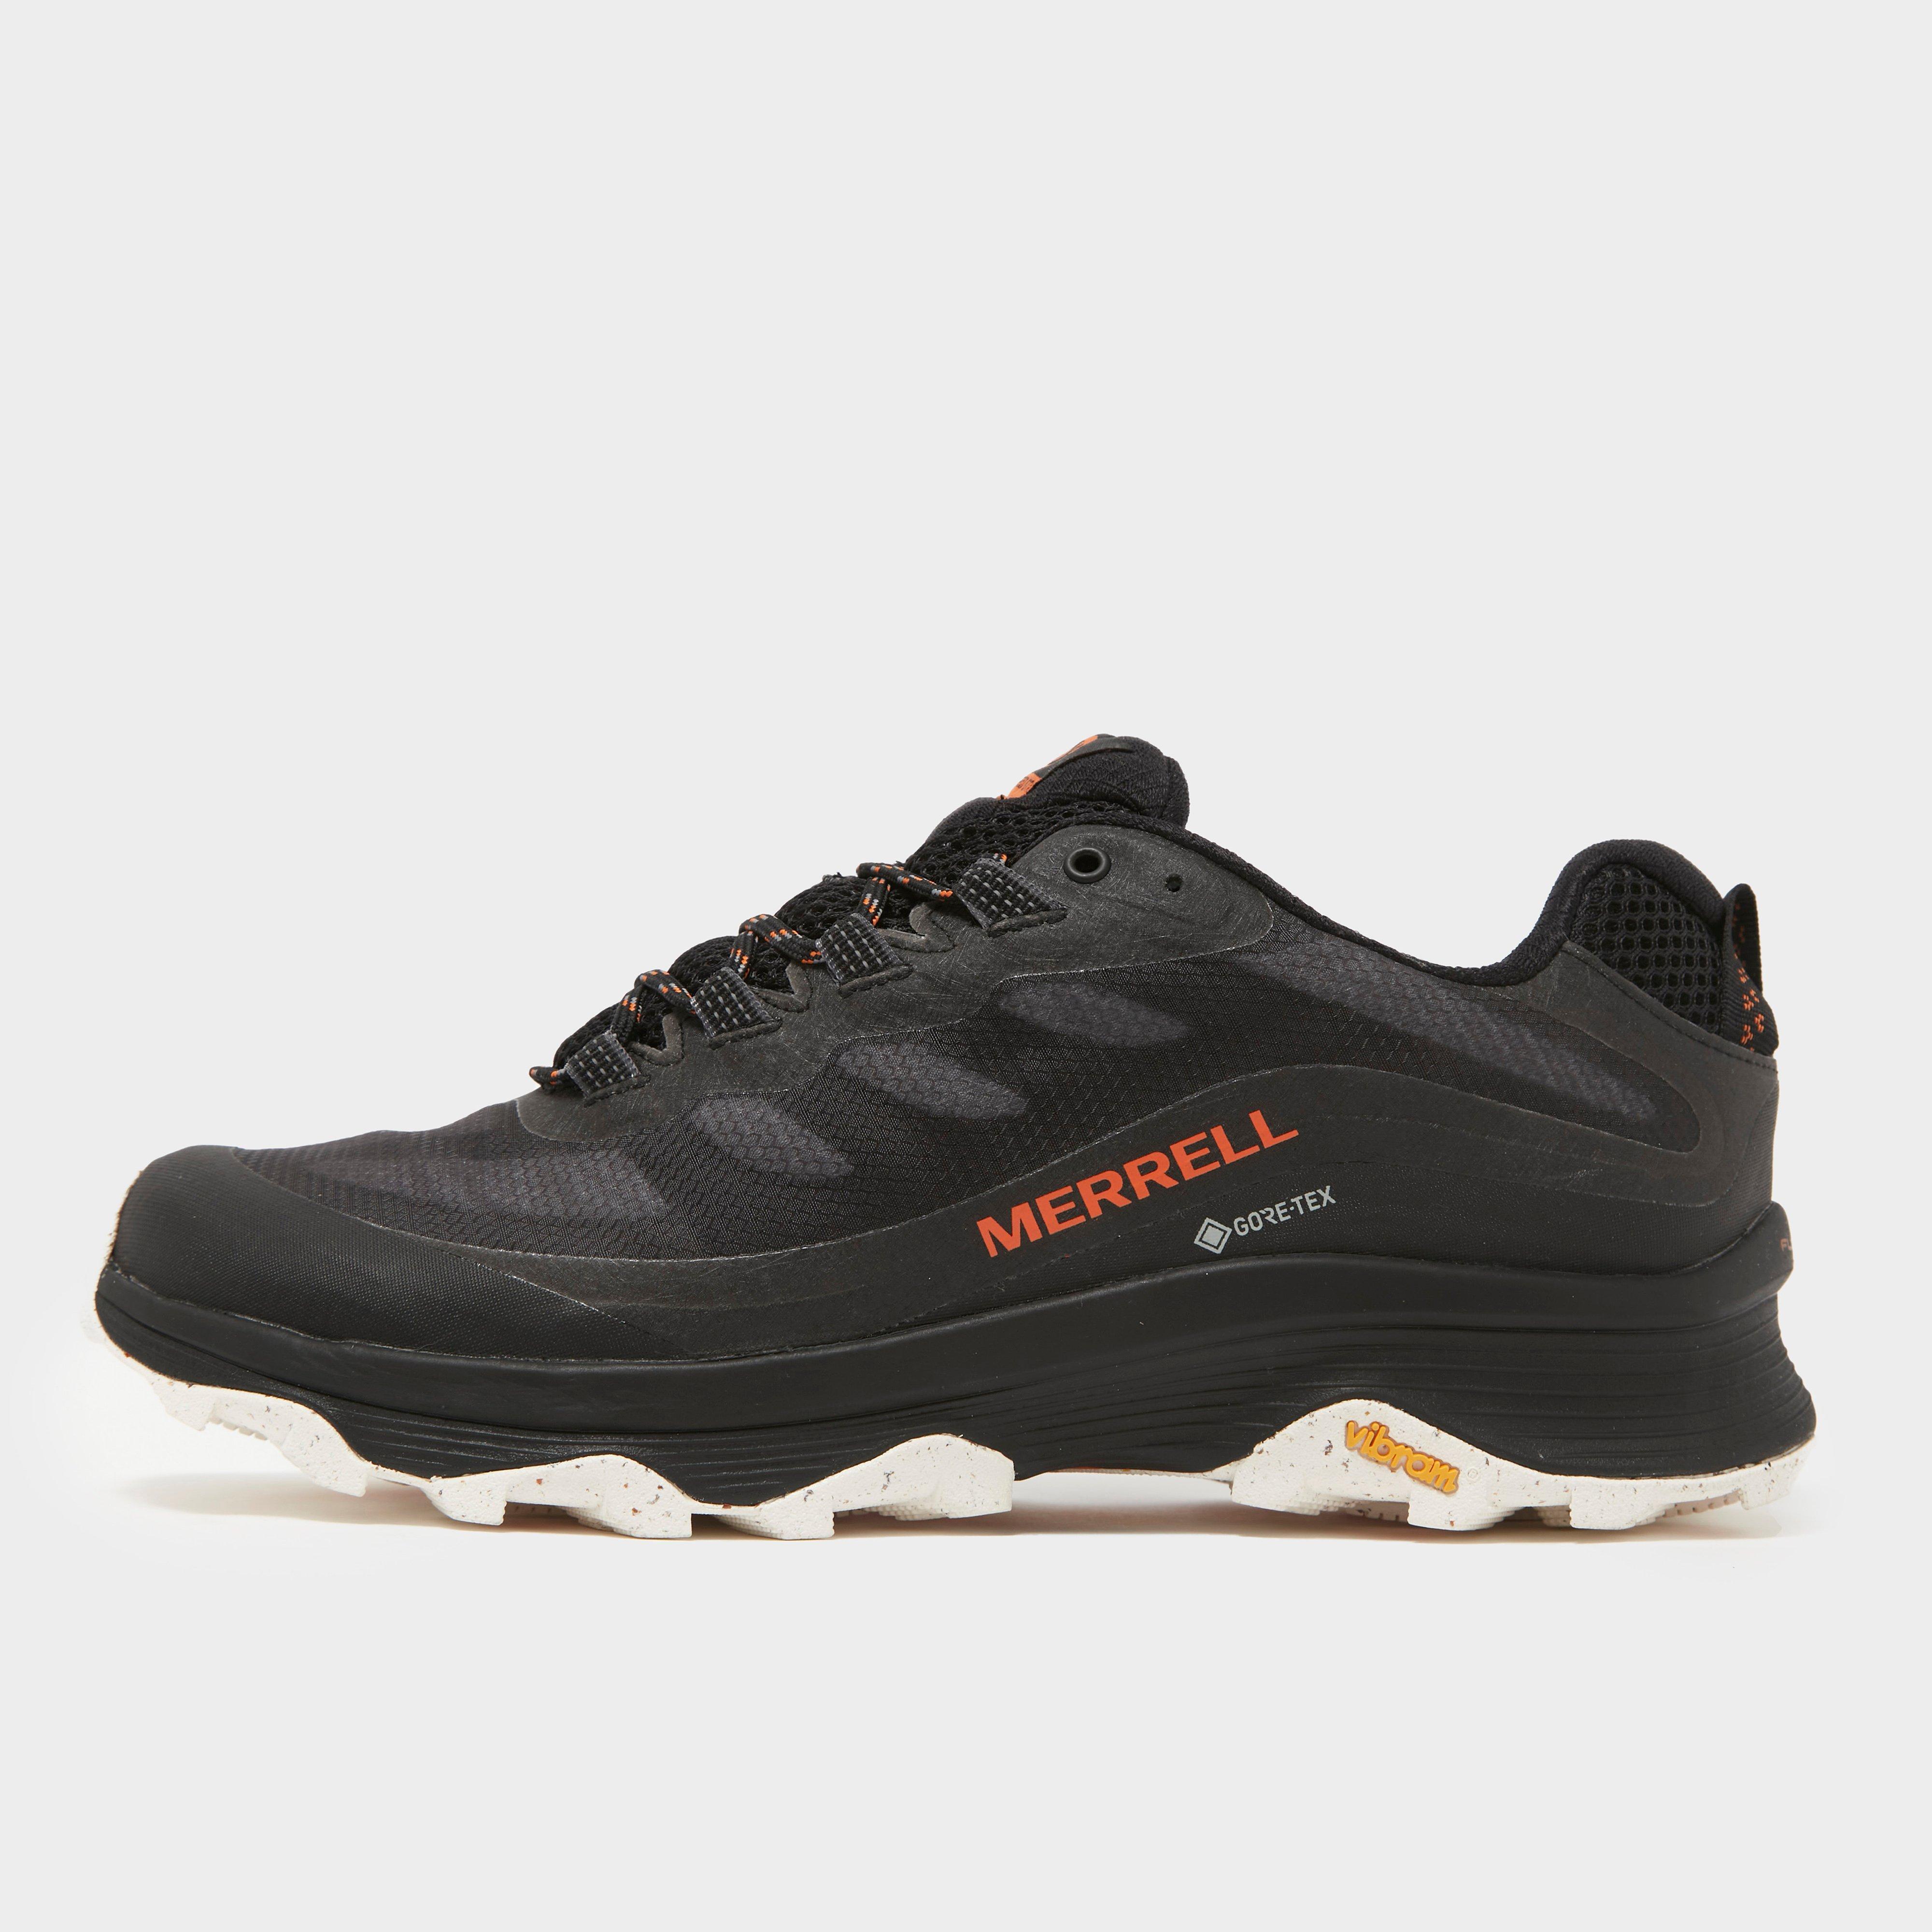 Merrell Men's Moab Speed Gore-Tex Shoe - Black/Black, Black